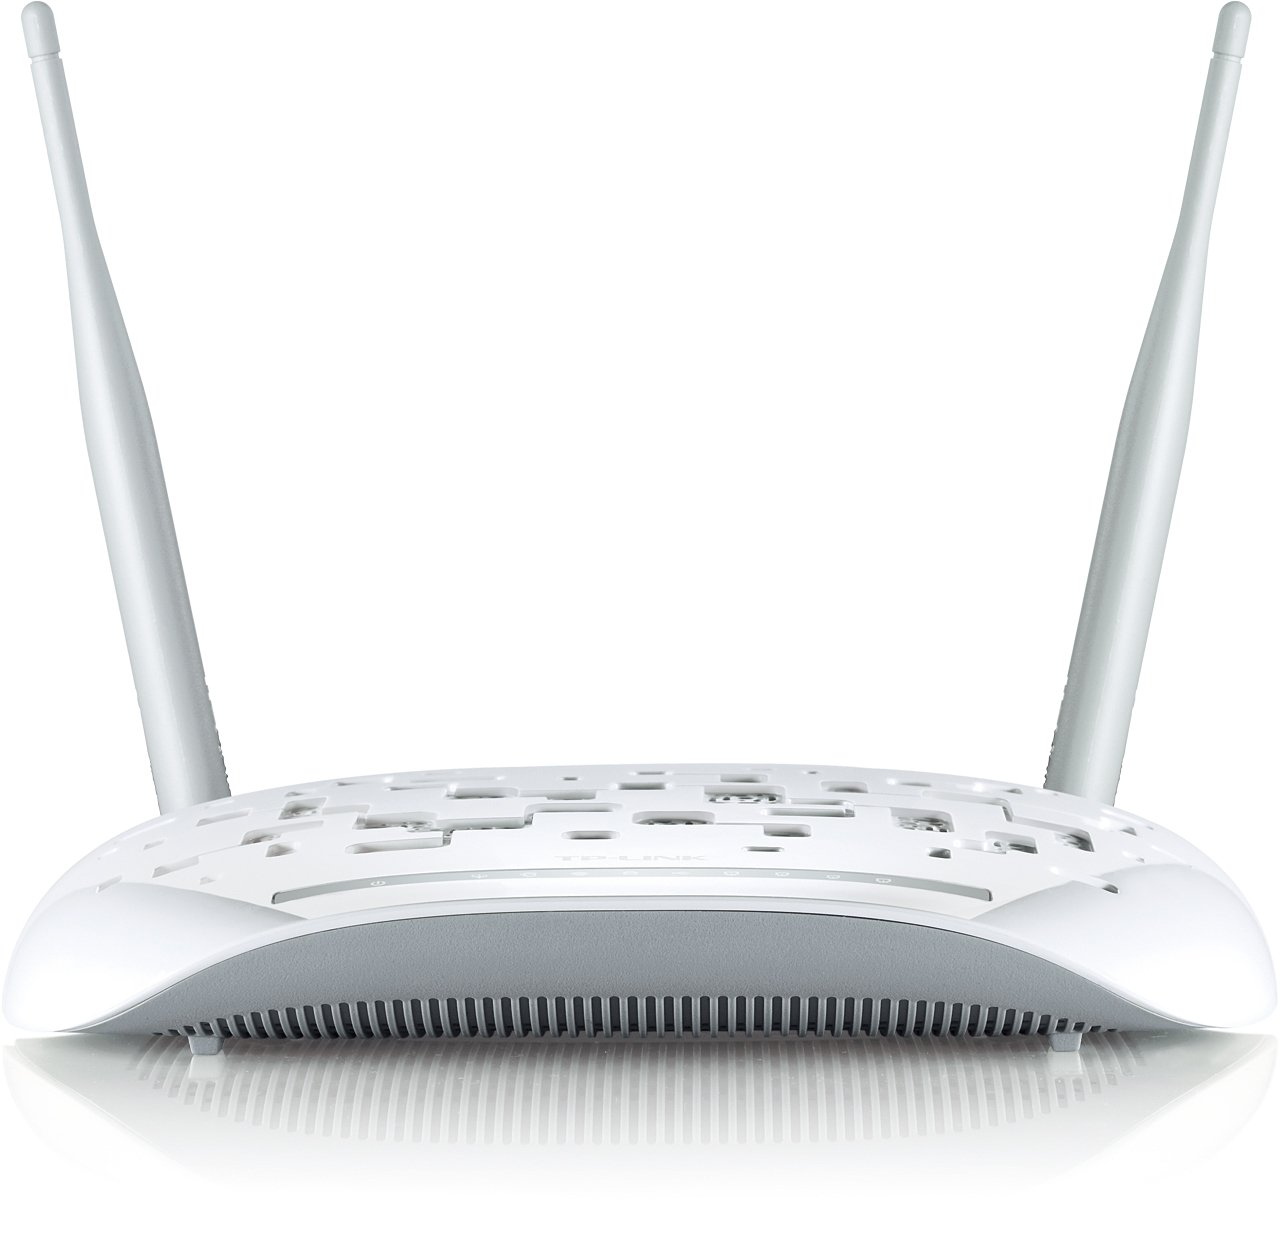 Splitter USB 2.4Ghz 300Mbps 802.11b//g//n 2x 5dBi Detachable Antennas TP-LINK TD-W8968 Wireless N300 ADSL2+ Modem Router